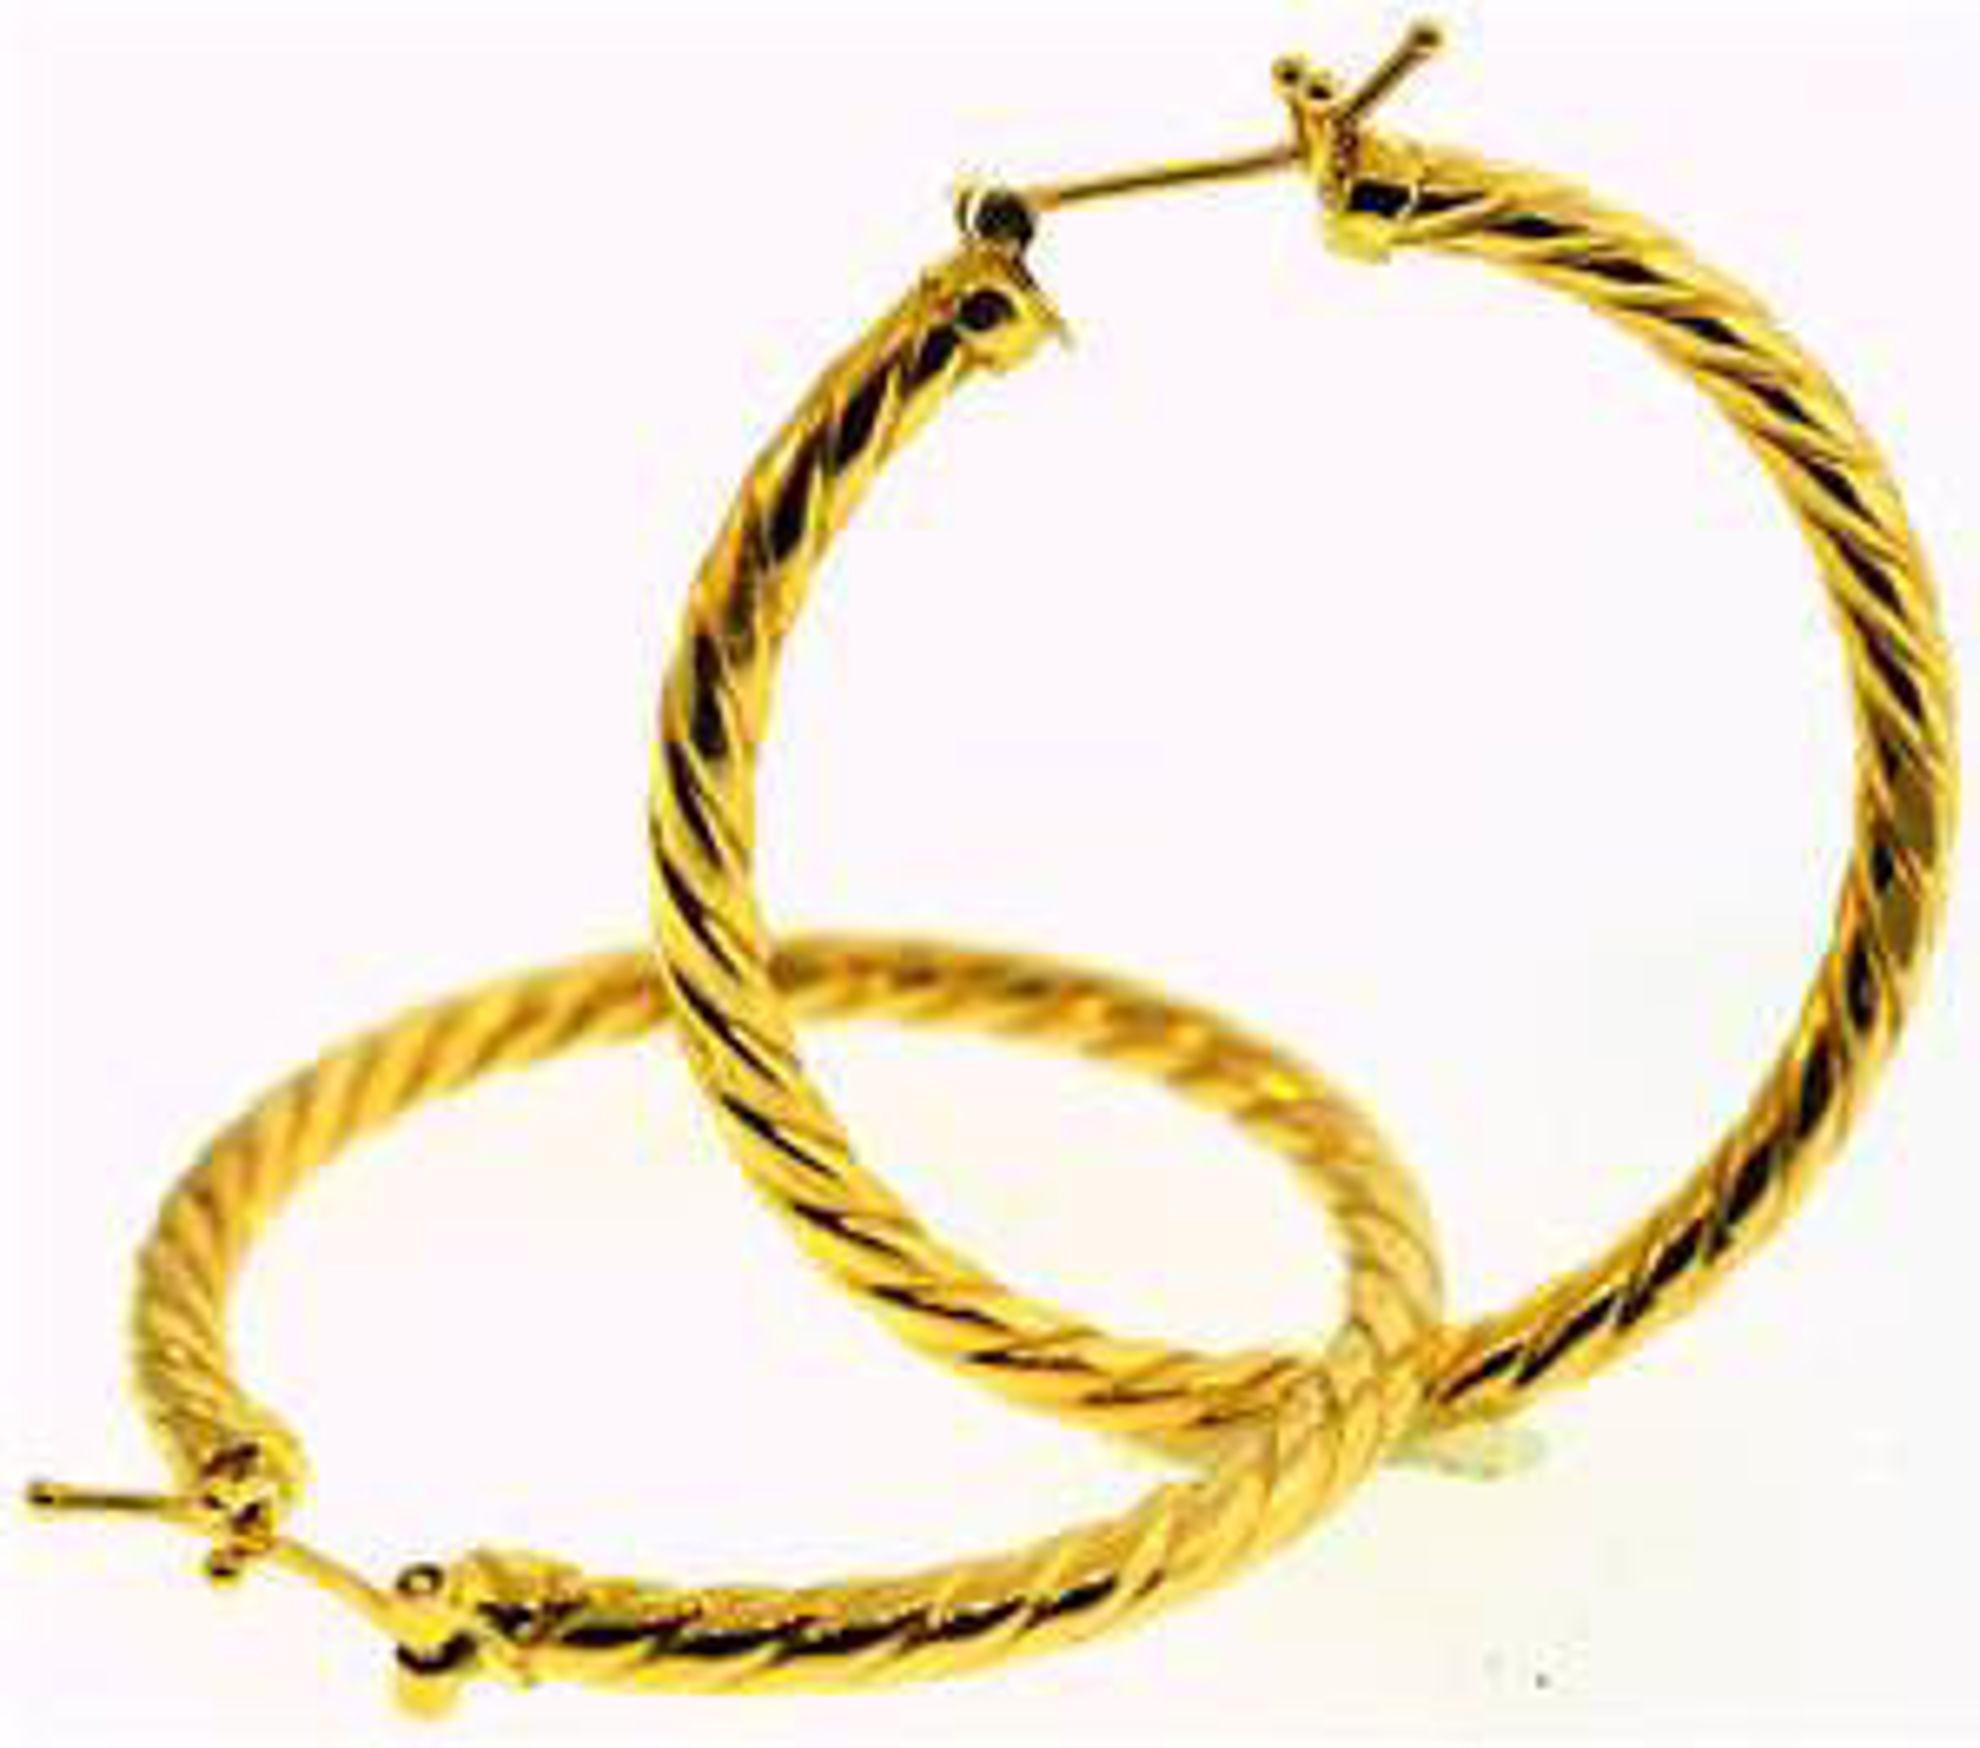 Picture of Earrings 18kt-3.0 DWT, 4.7 Grams